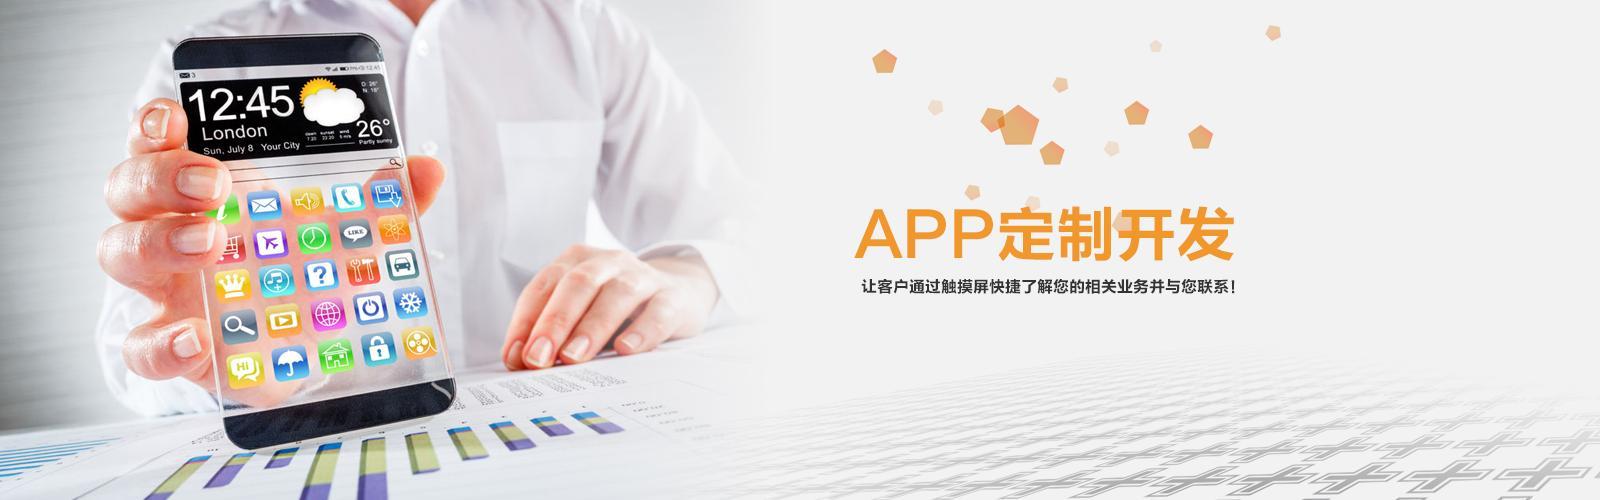 App开发数据分析应从哪些方面入手?